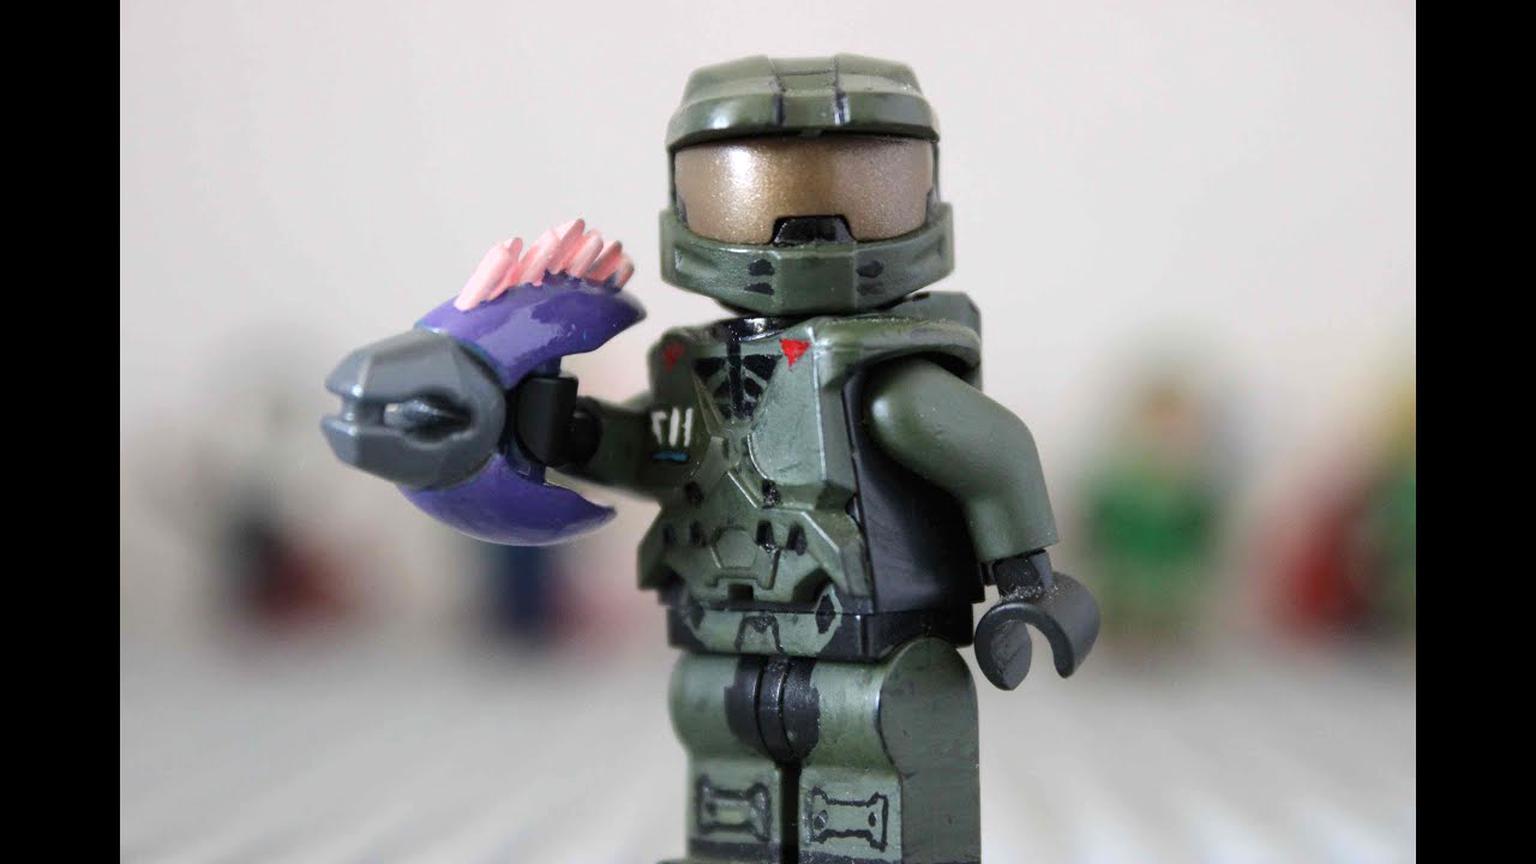 Lego Halo Custom Spartan Master Chief Space Marine Minifigure Soldier